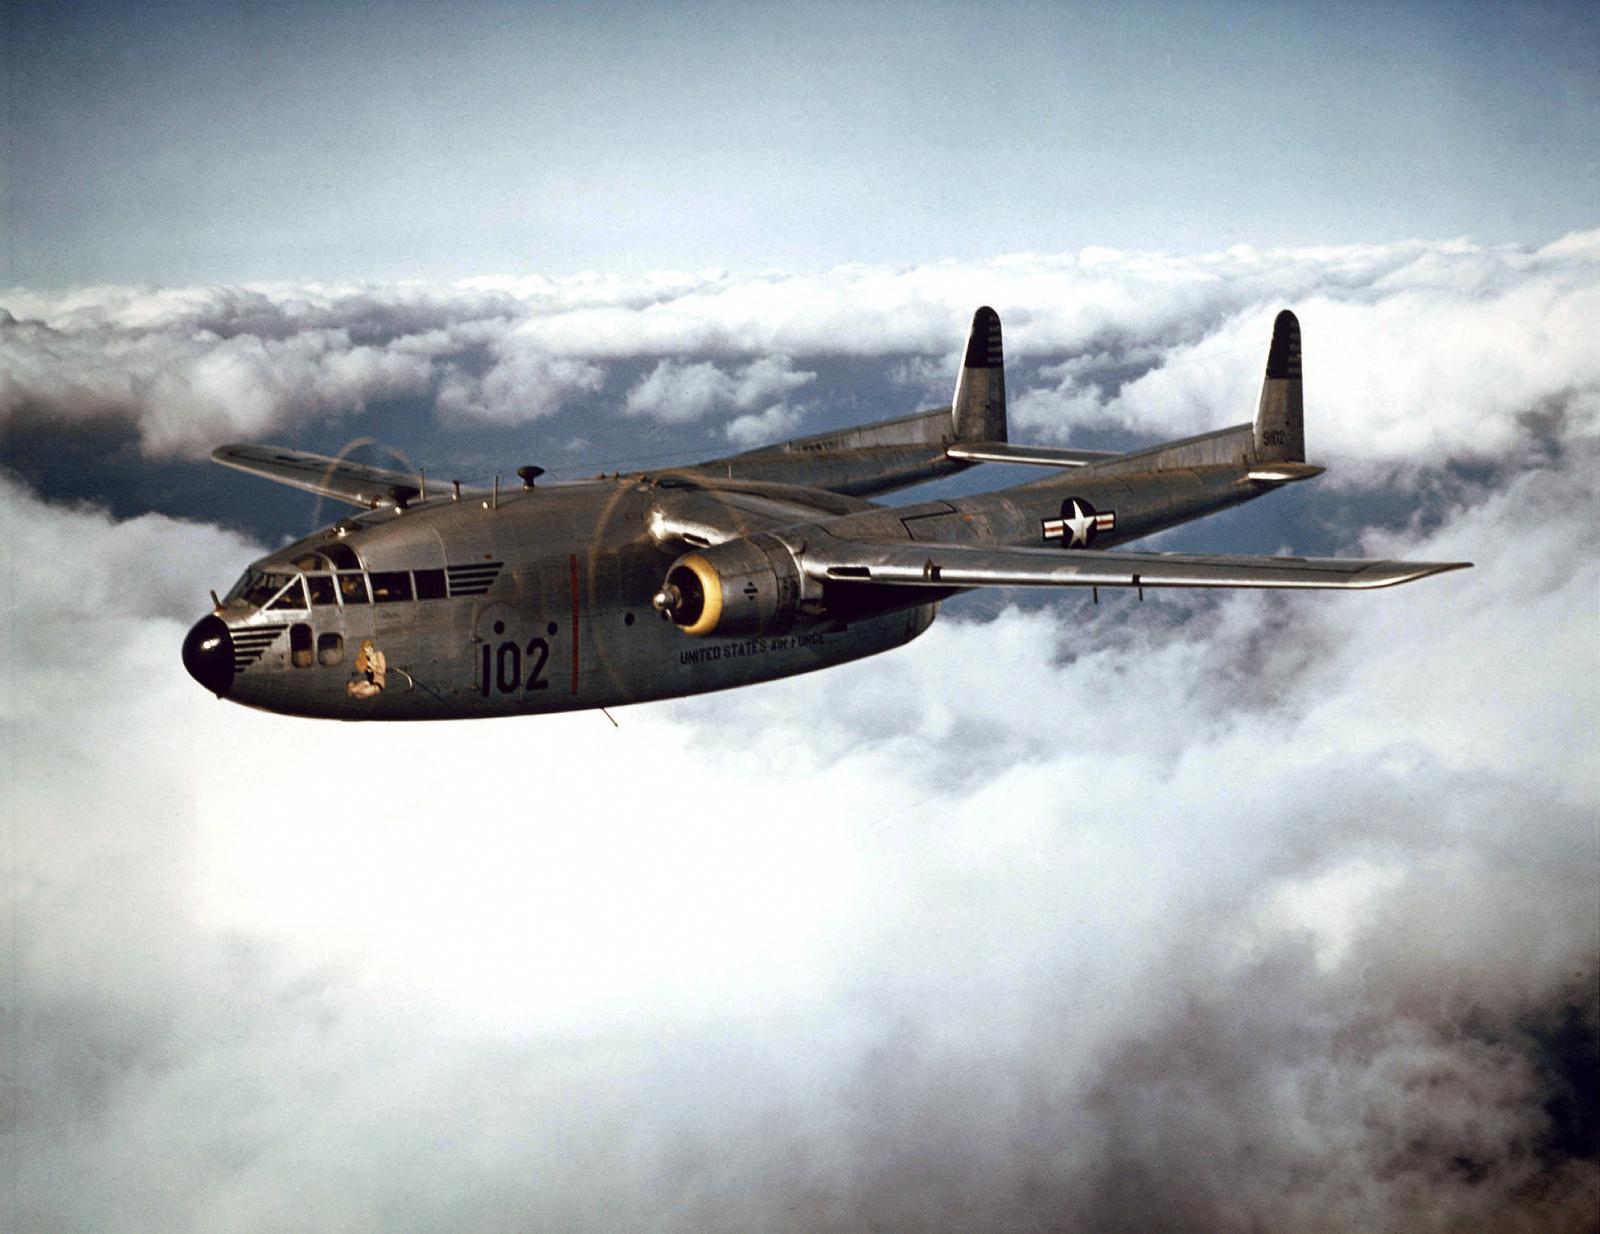 Fairchild_C-119B_of_the_314th_Troop_Carrier_Group_in_flight%2C_1952_%28021001-O-9999G-016%29.jpg